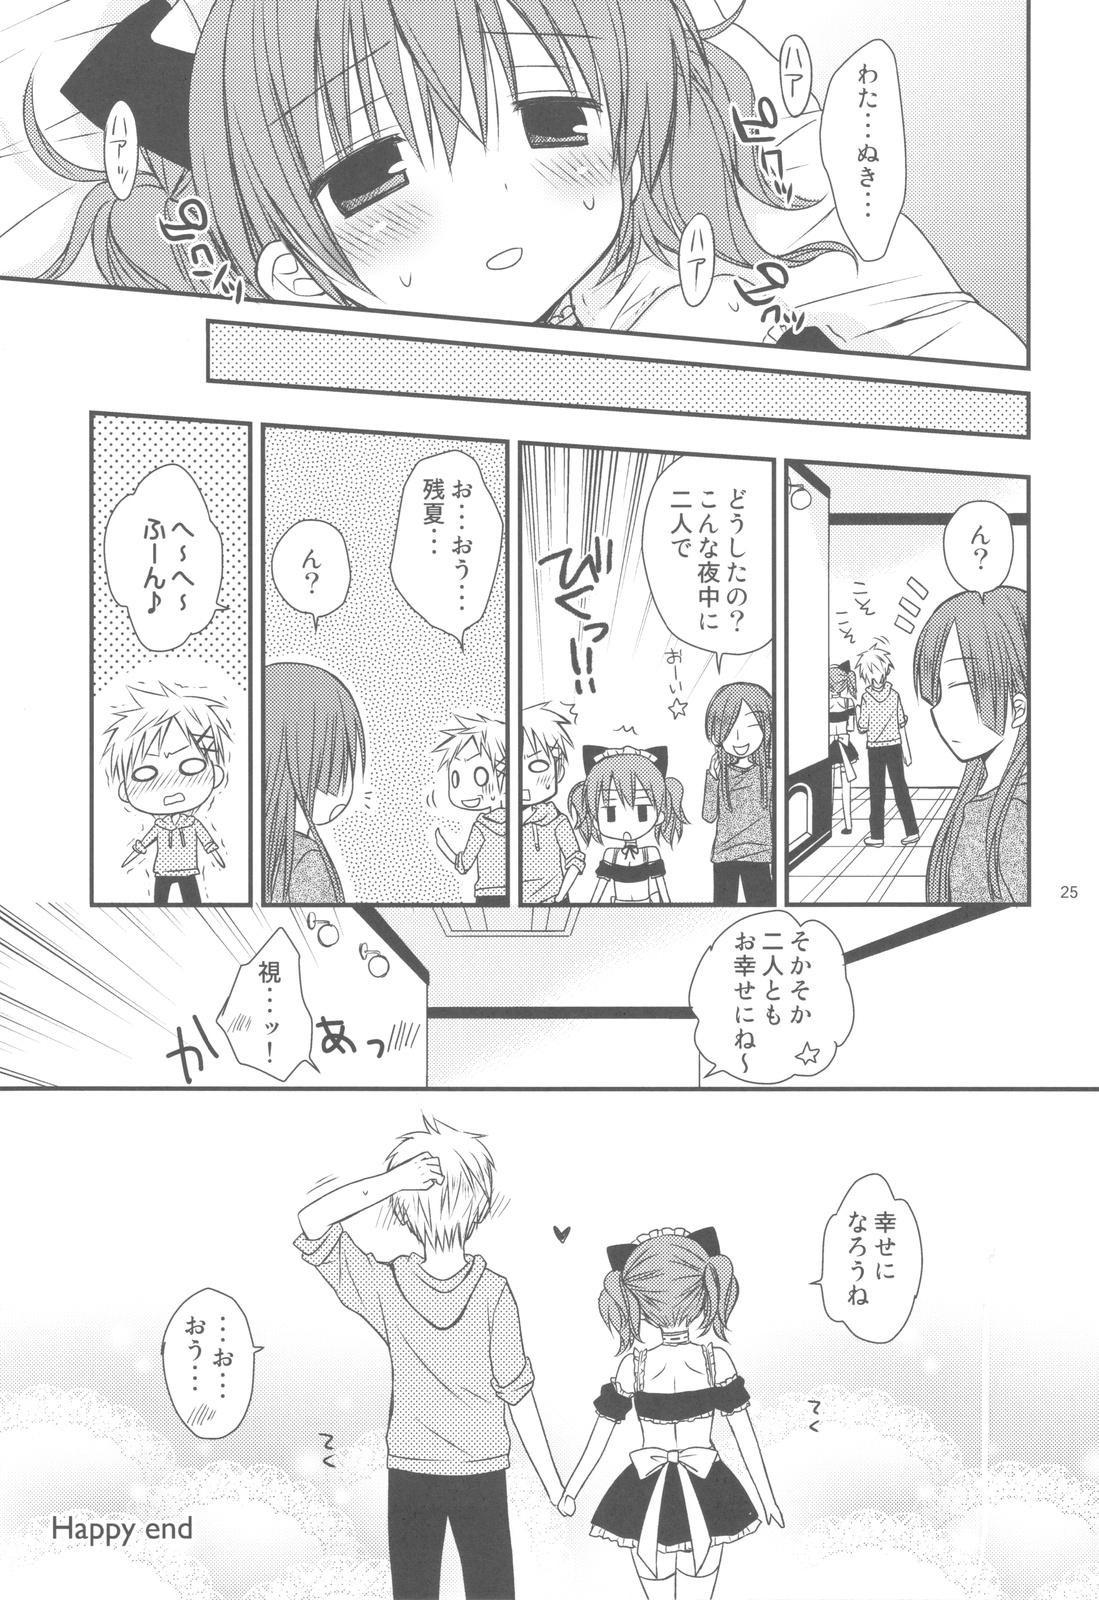 Chiisana Ai no Monogatari 23